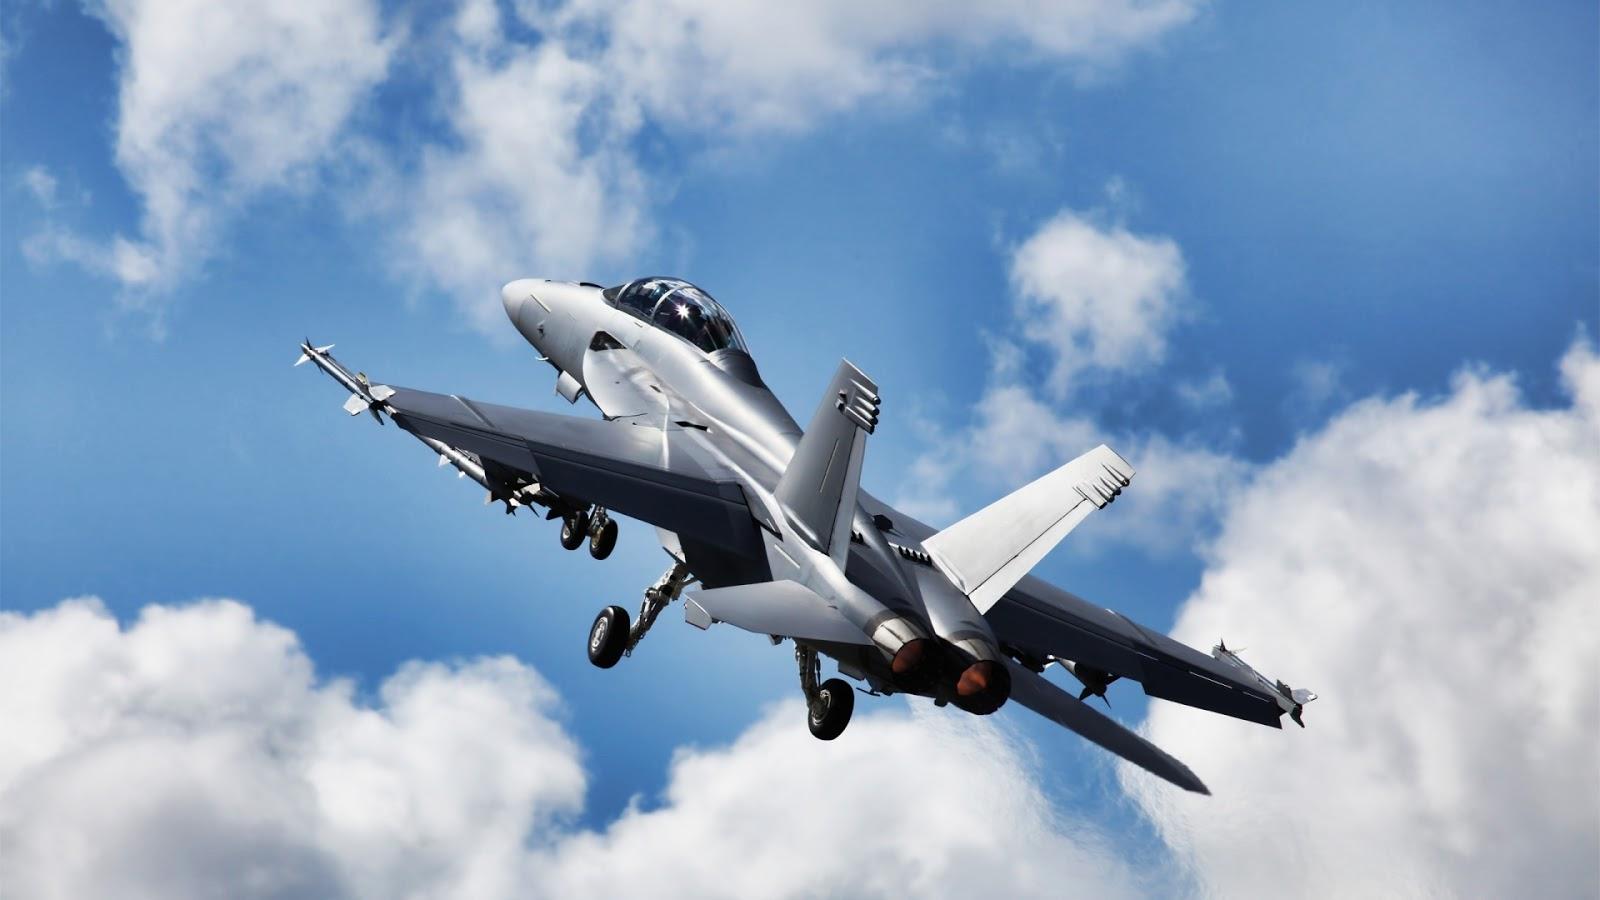 FA 18 Super Hornet